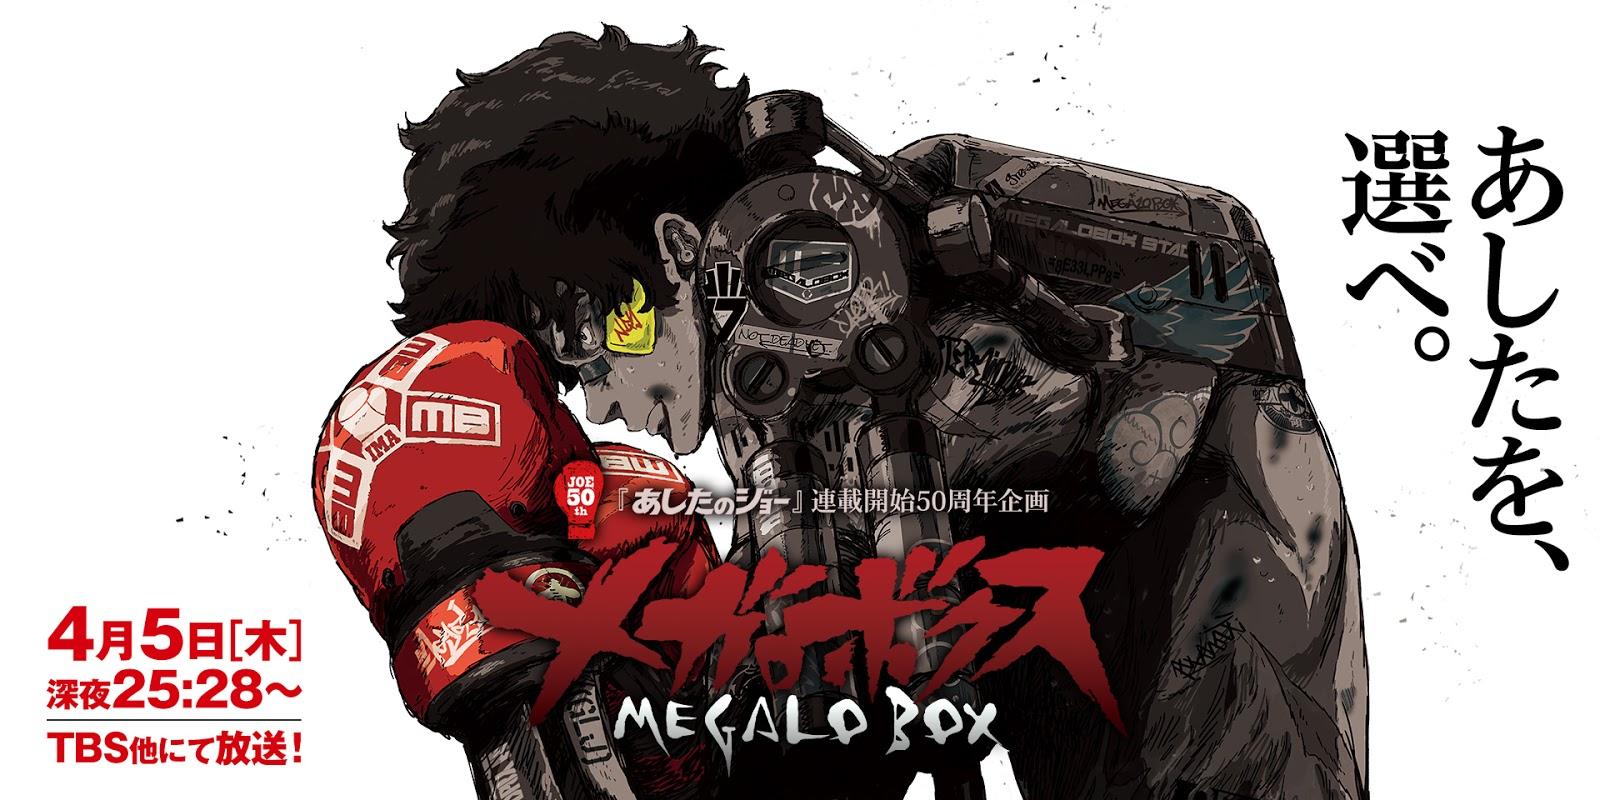 Megalo Box anime wallpaper hd